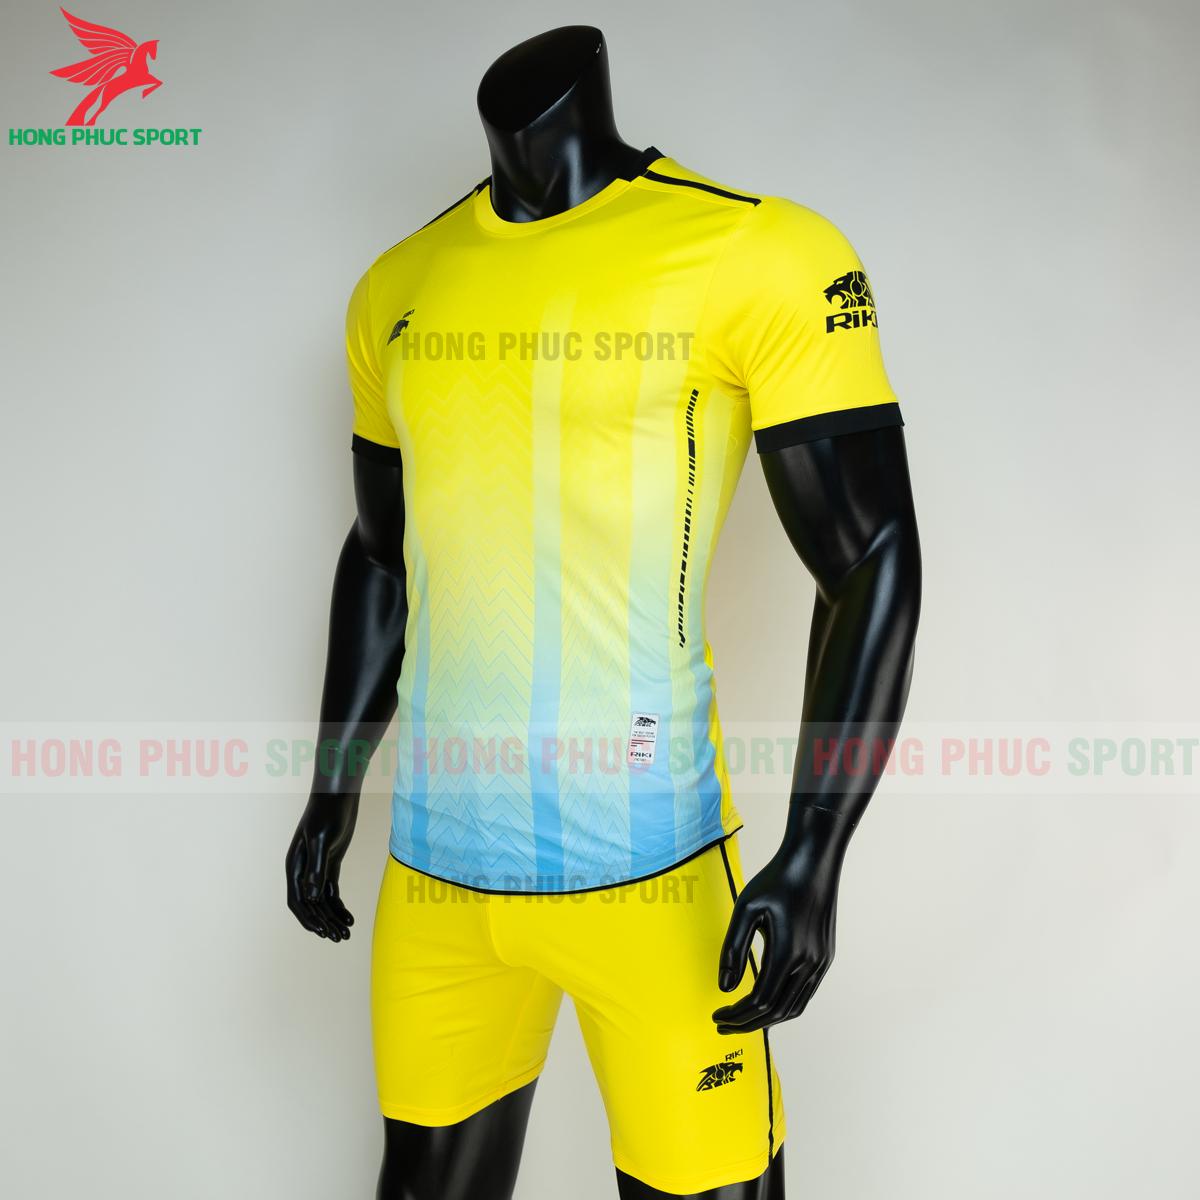 https://cdn.hongphucsport.com/unsafe/s4.shopbay.vn/files/285/ao-bong-da-khong-logo-riki-furior-mau-vang-4-605016236bc32.png